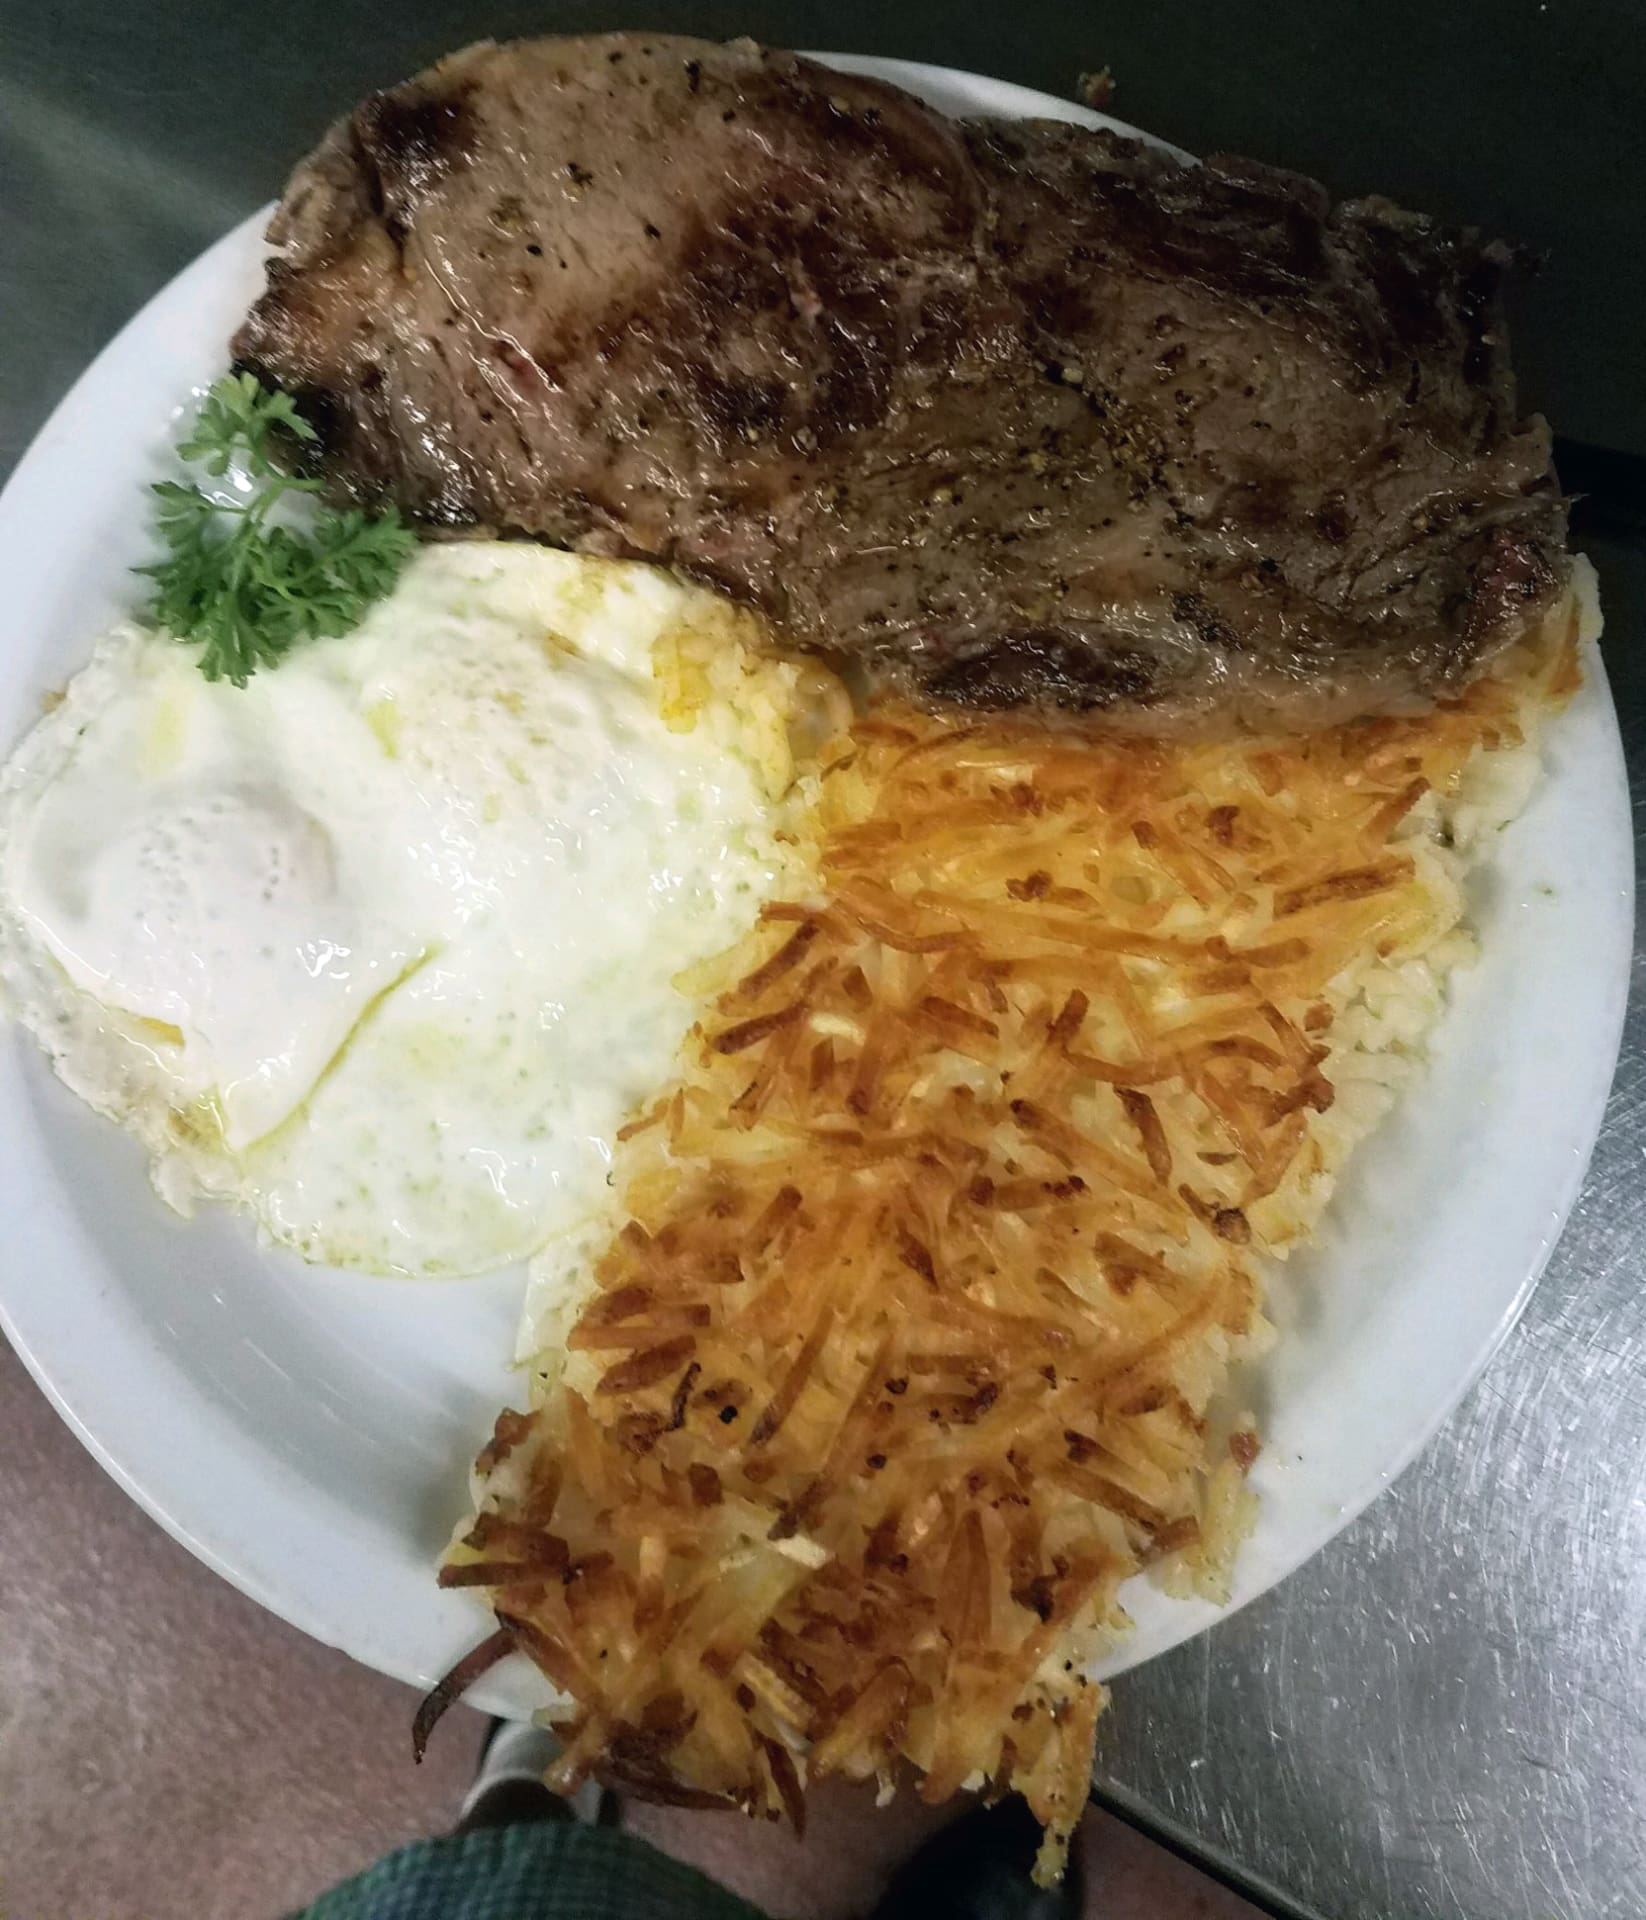 14 oz. Rib Eye Steak & Eggs